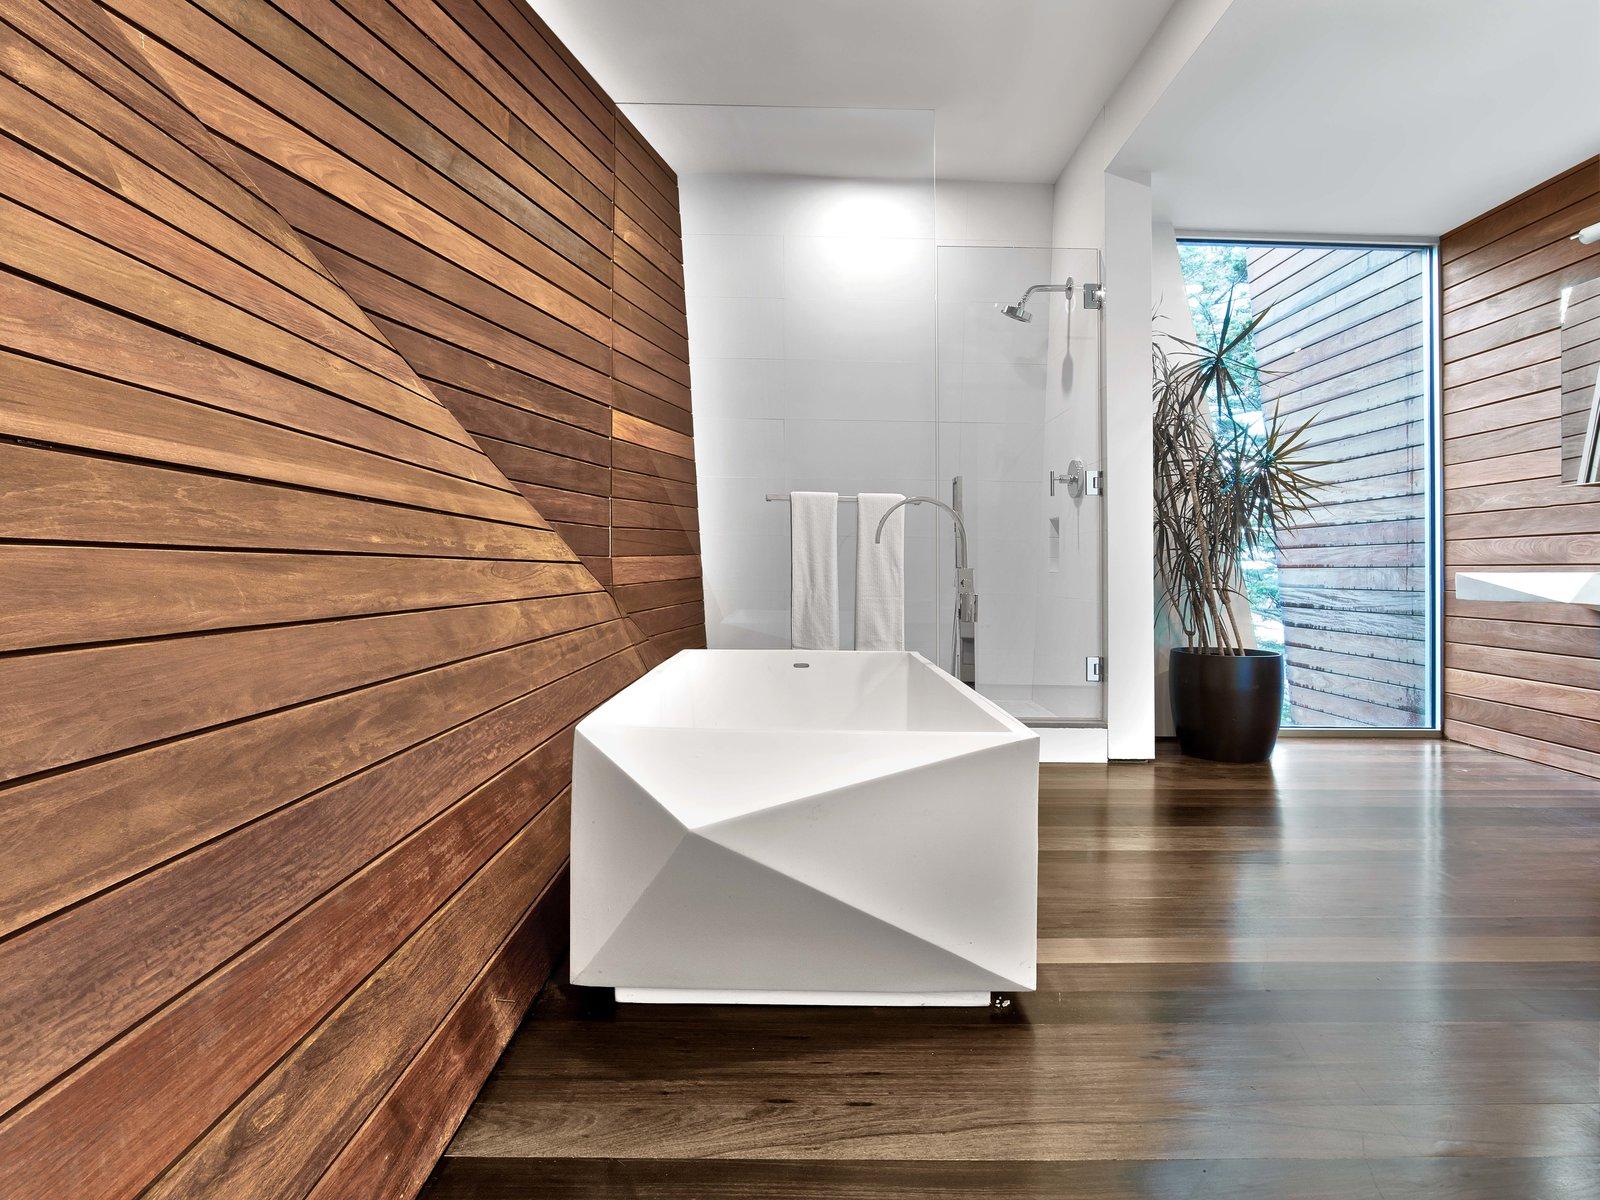 Bath Room and Medium Hardwood Floor  Cape Cod - Beach House by Hariri & Hariri Architecture